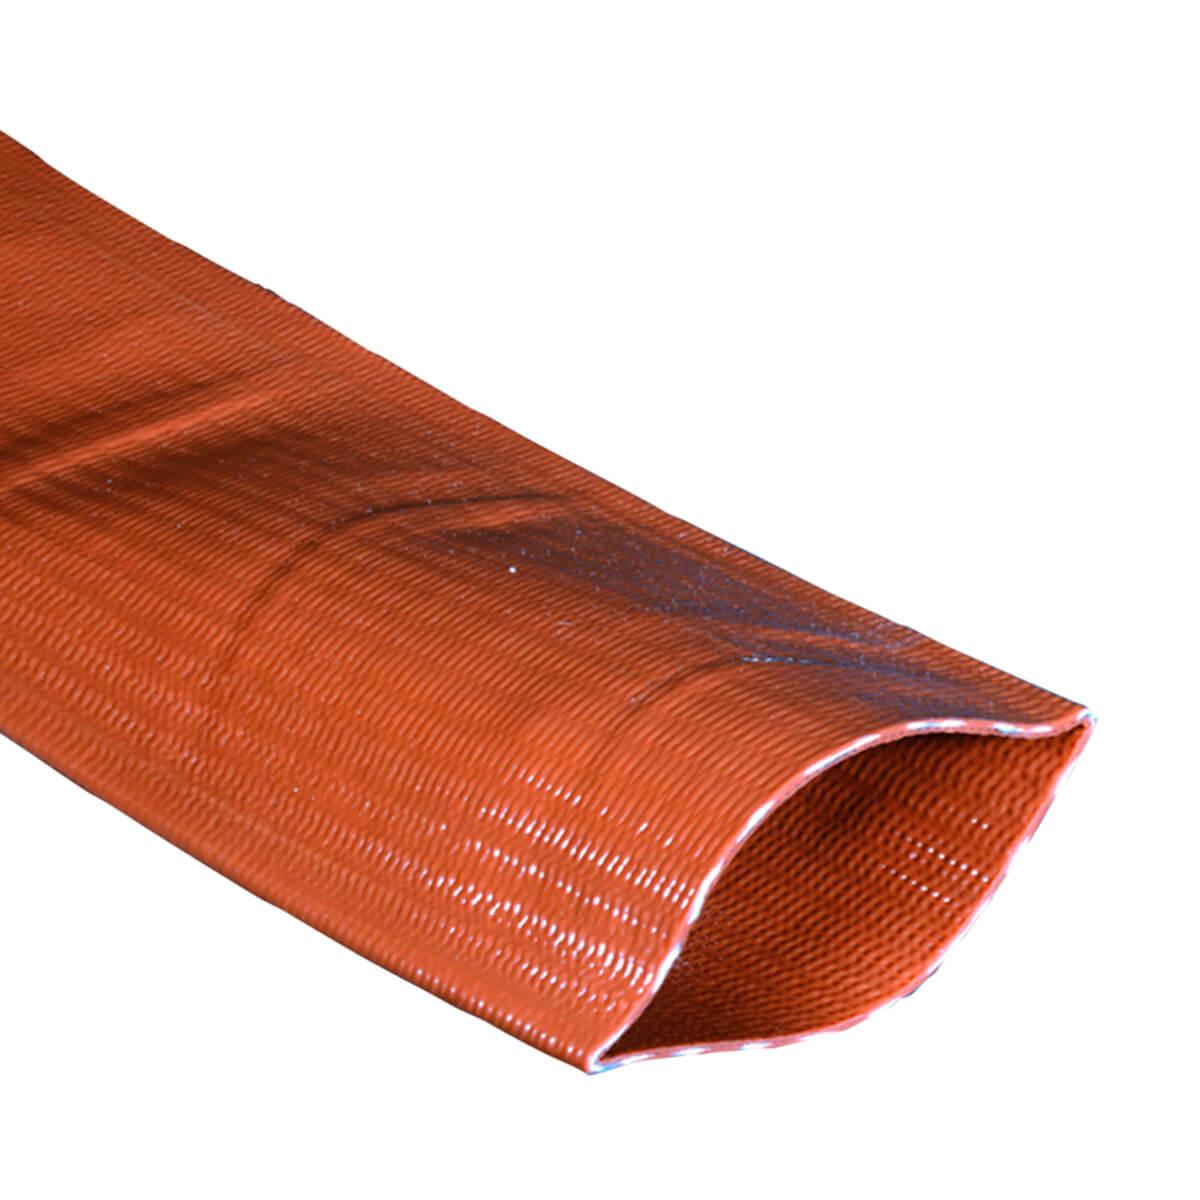 "Brown Medium-Duty PVC Layflat Discharge Hose - 3"" - Price Per Foot"